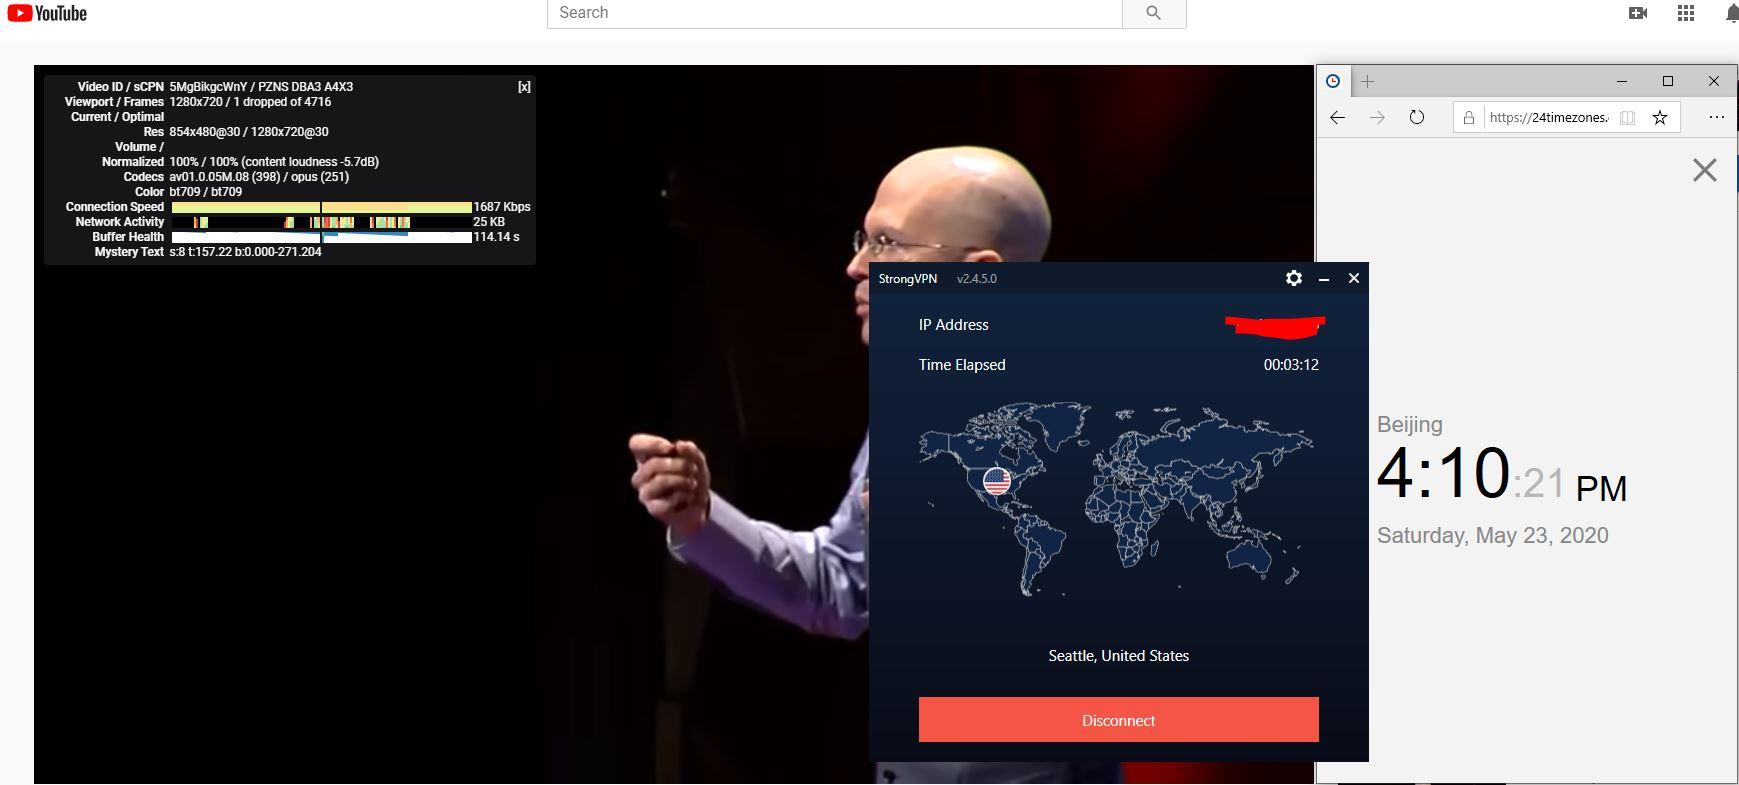 Windows10 StrongVPN IKEv2 USA-Seattle 中国VPN 翻墙 科学上网 youtube测速-20200523